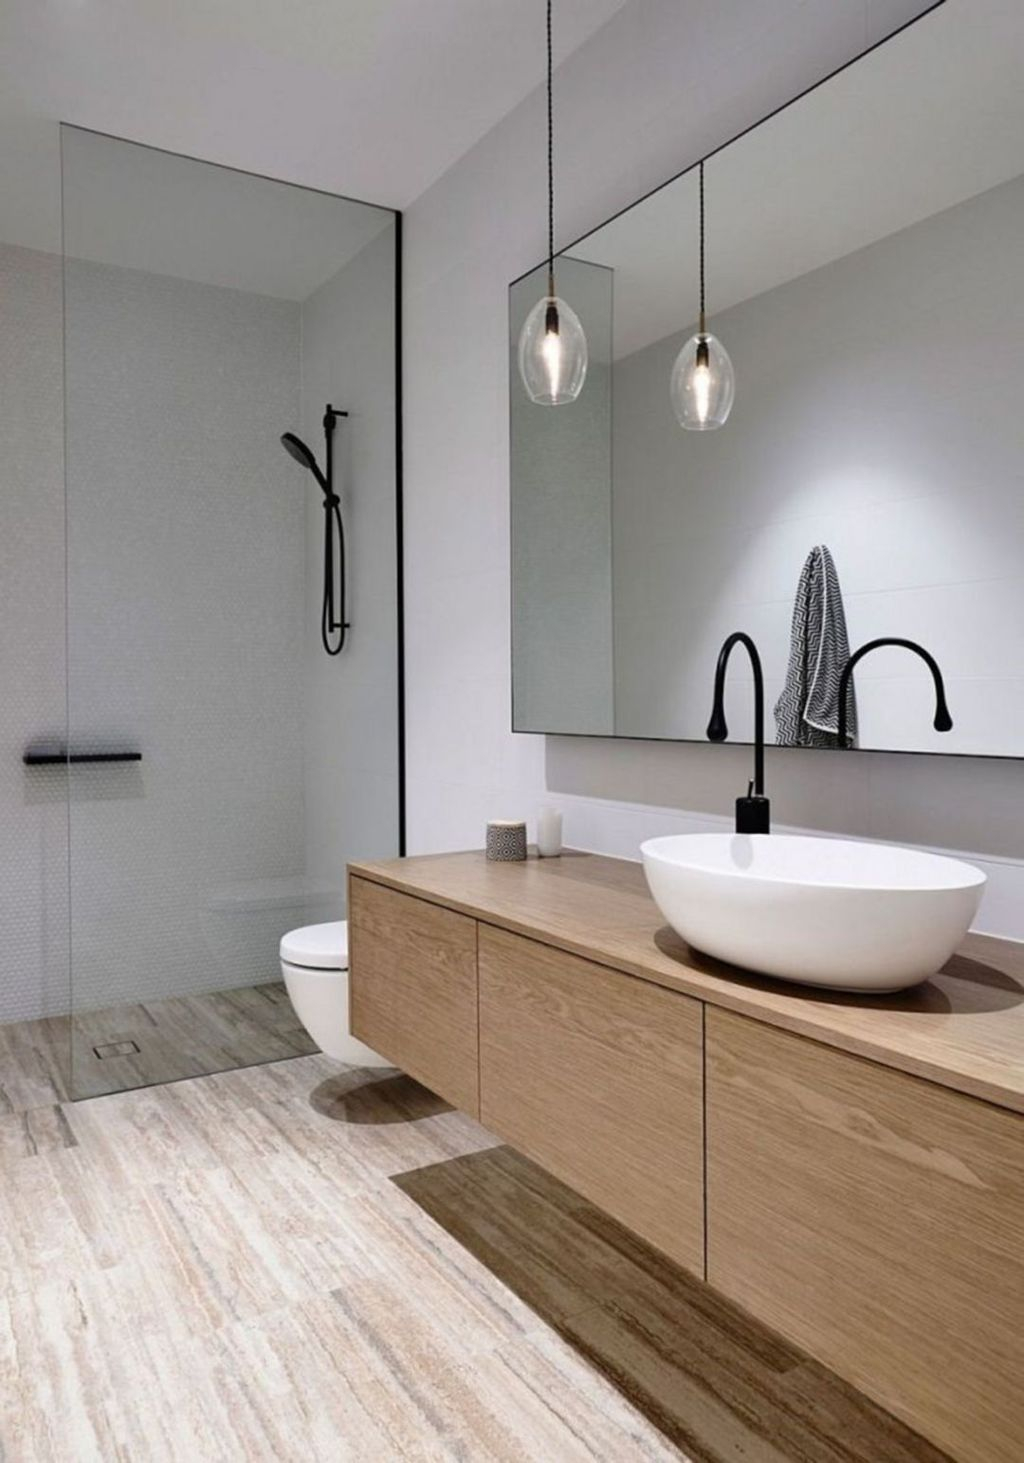 Best Minimalist Bathroom Design Ideas That Trendy Now 24